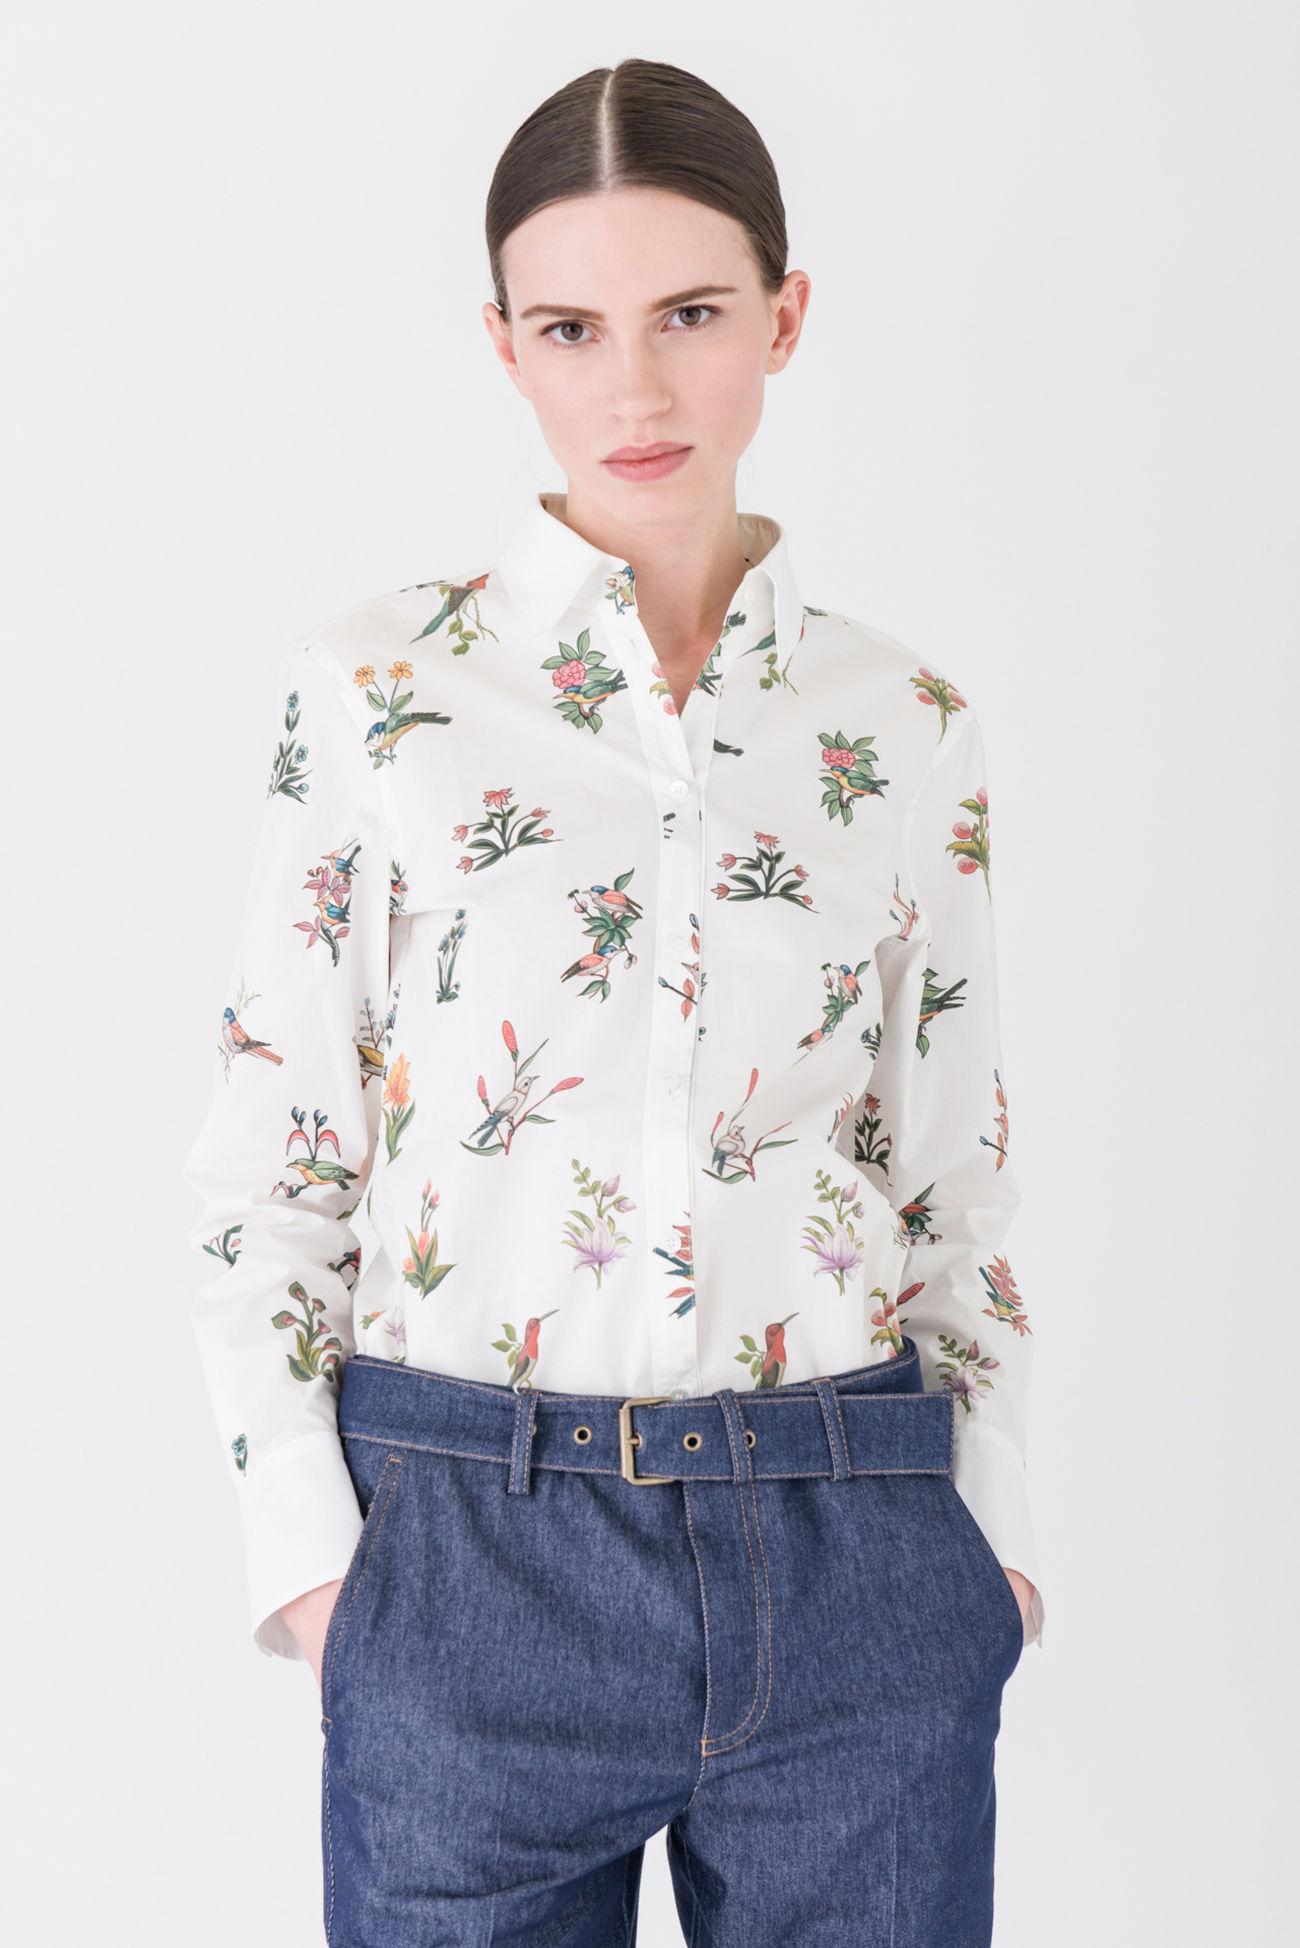 Stylish cotton blouse with elegant bird print